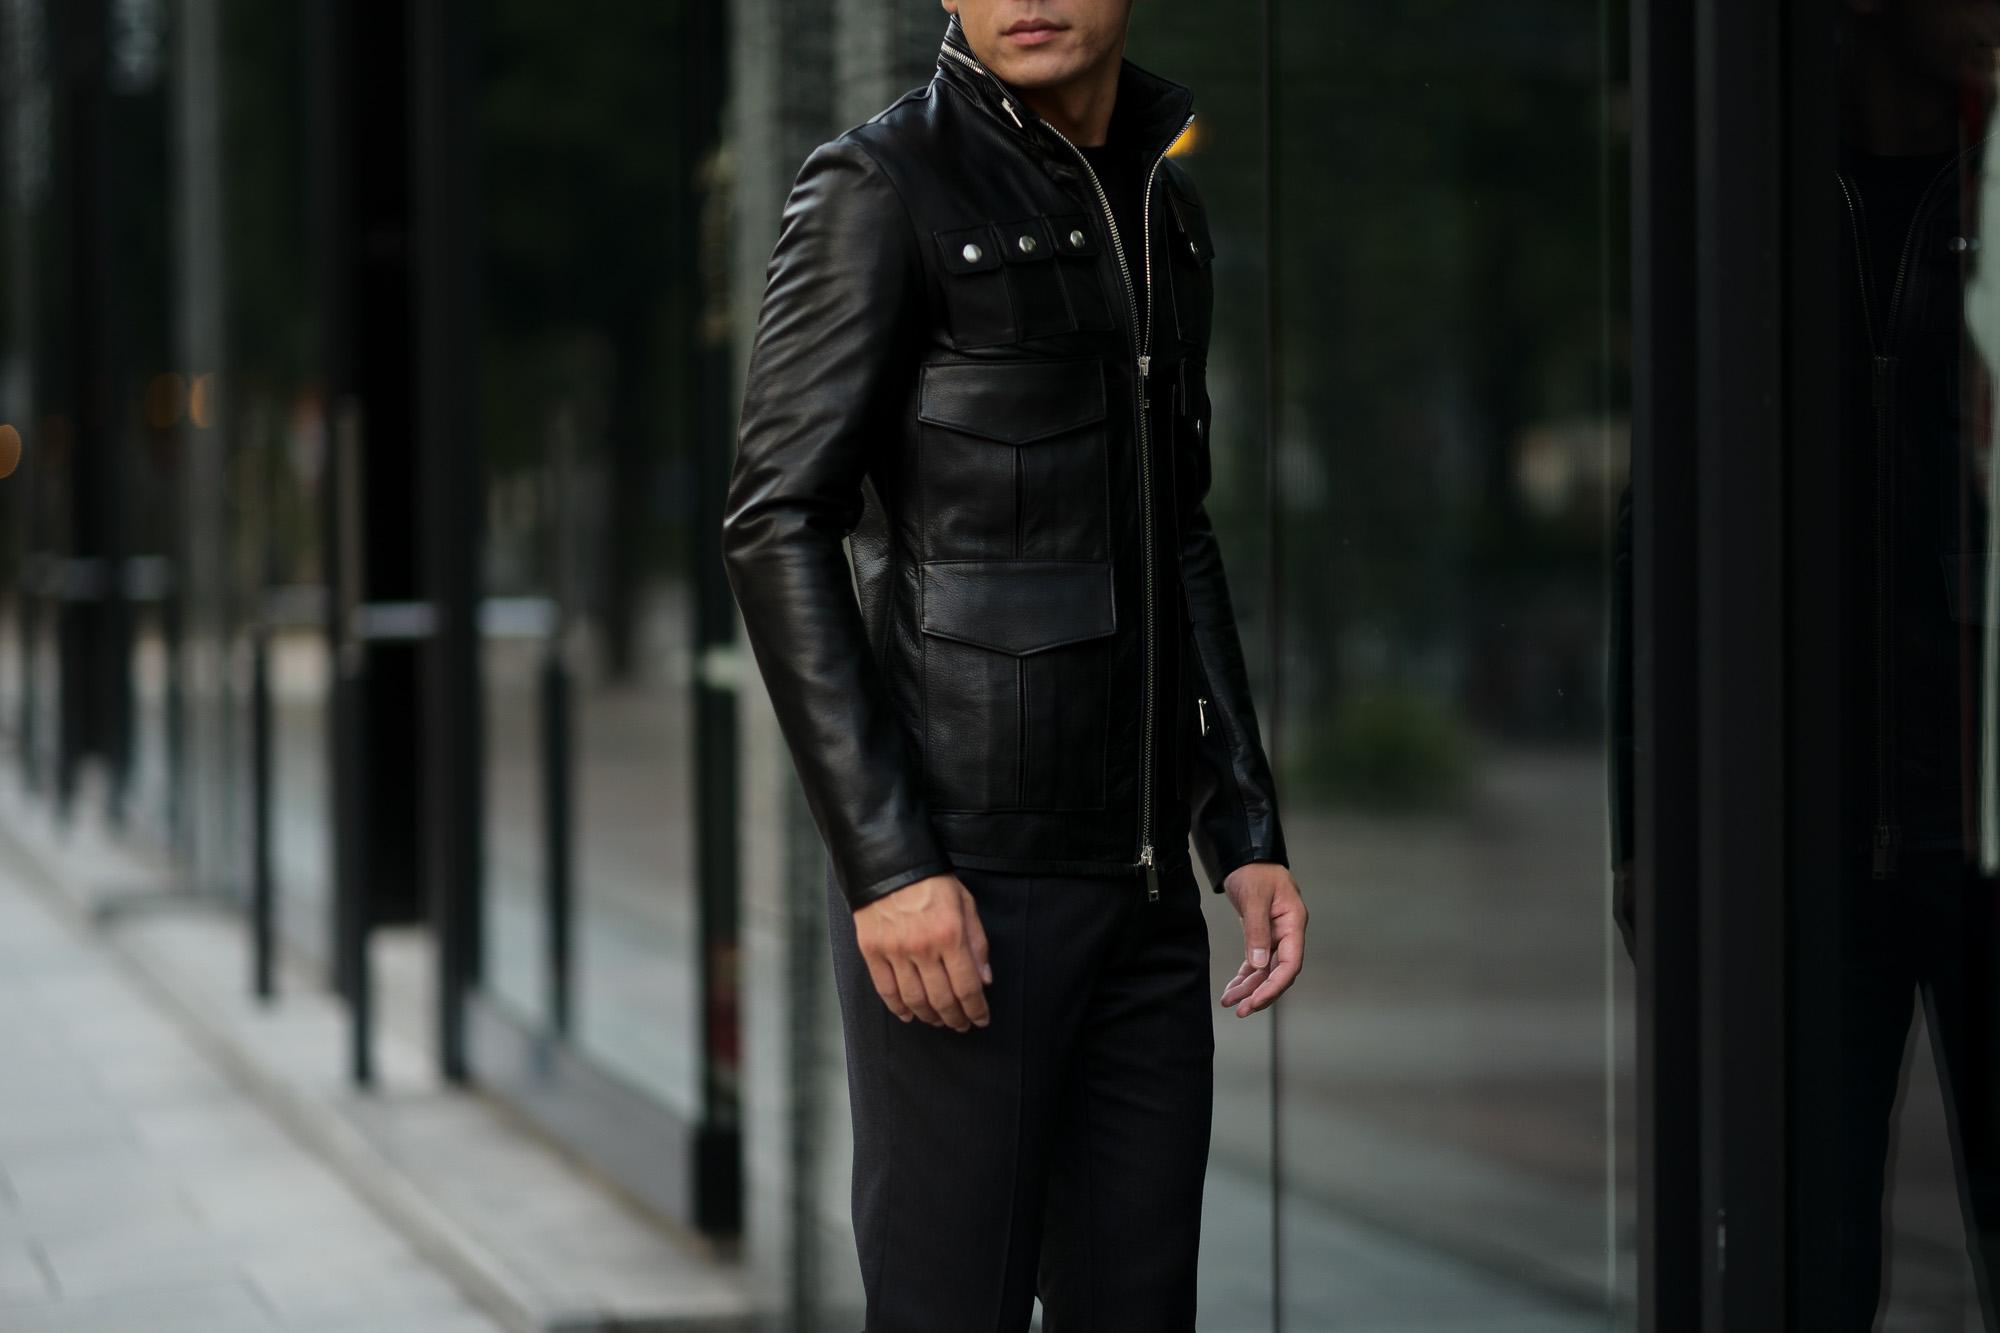 Cuervo (クエルボ) Satisfaction Leather Collection (サティスファクション レザー コレクション) HUNK(ハンク) BUFFALO LEATHER (バッファロー レザー) レザージャケット BLACK(ブラック) MADE IN JAPAN (日本製) 2019 秋冬新作 愛知 名古屋 altoediritto アルトエデリット バイオハザード ハンク バイオ BIOHAZARD